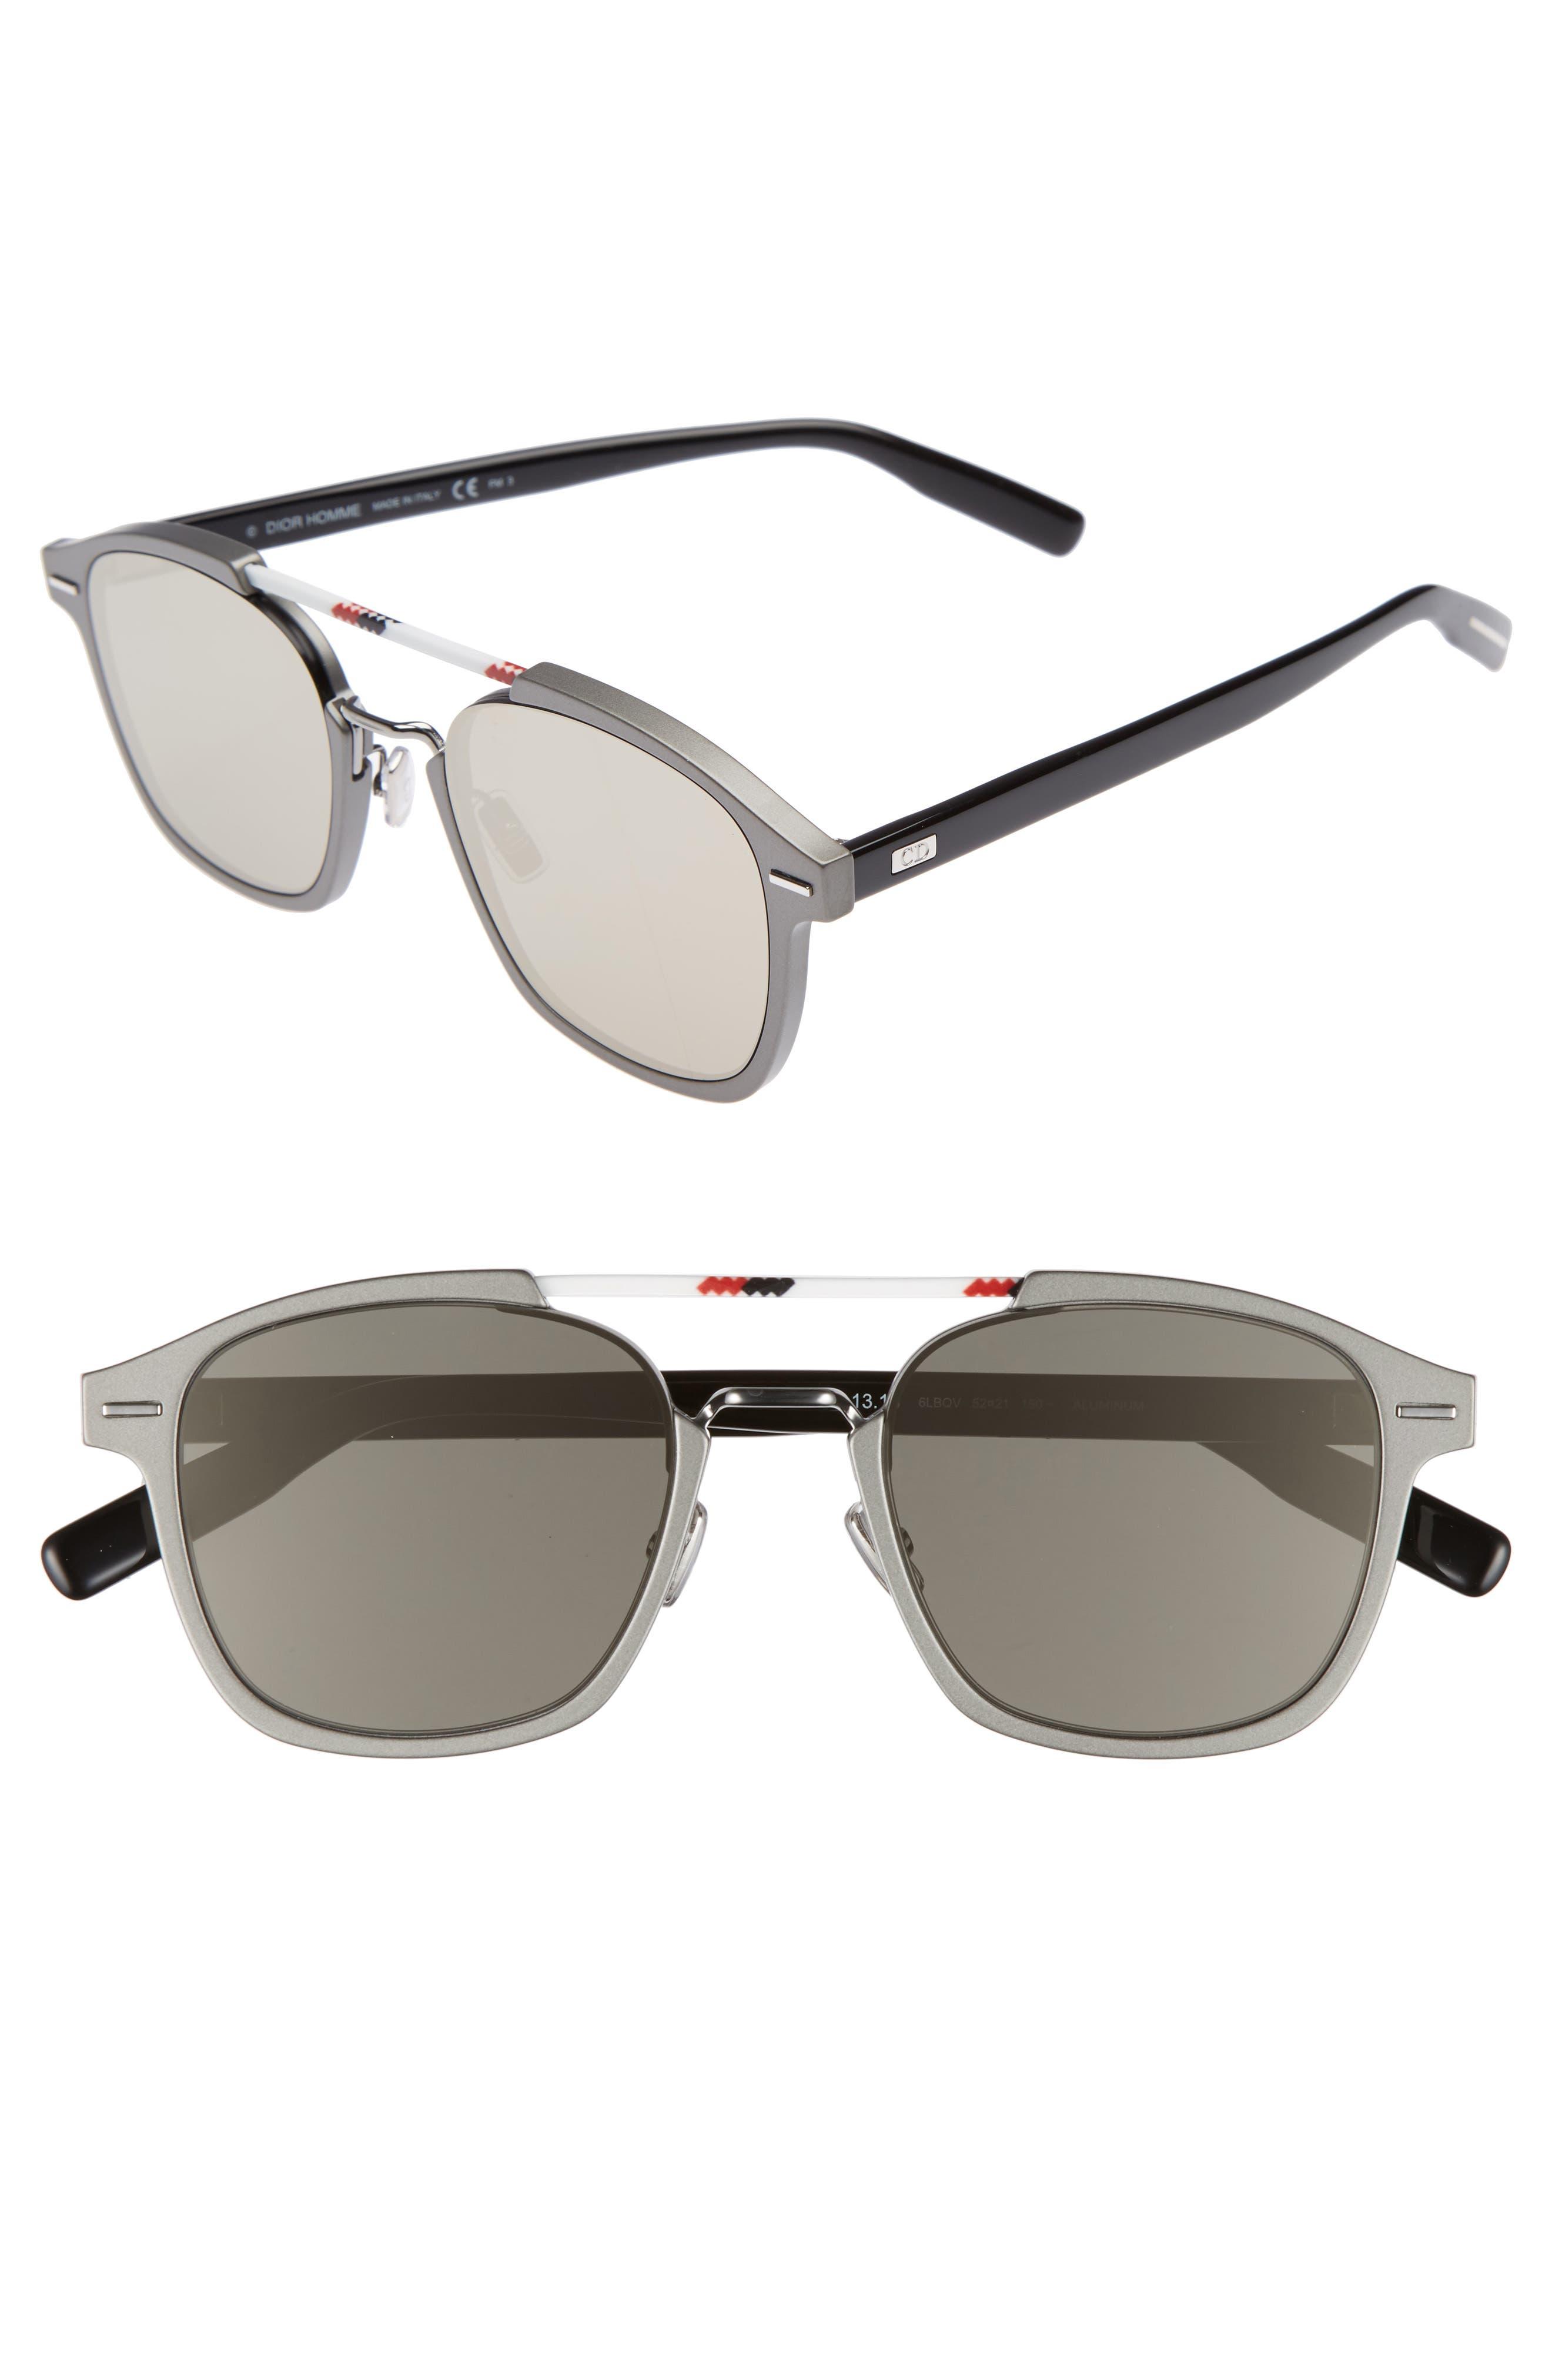 AL13.13 52mm Sunglasses,                         Main,                         color, RUTHENIUM/ IVORY